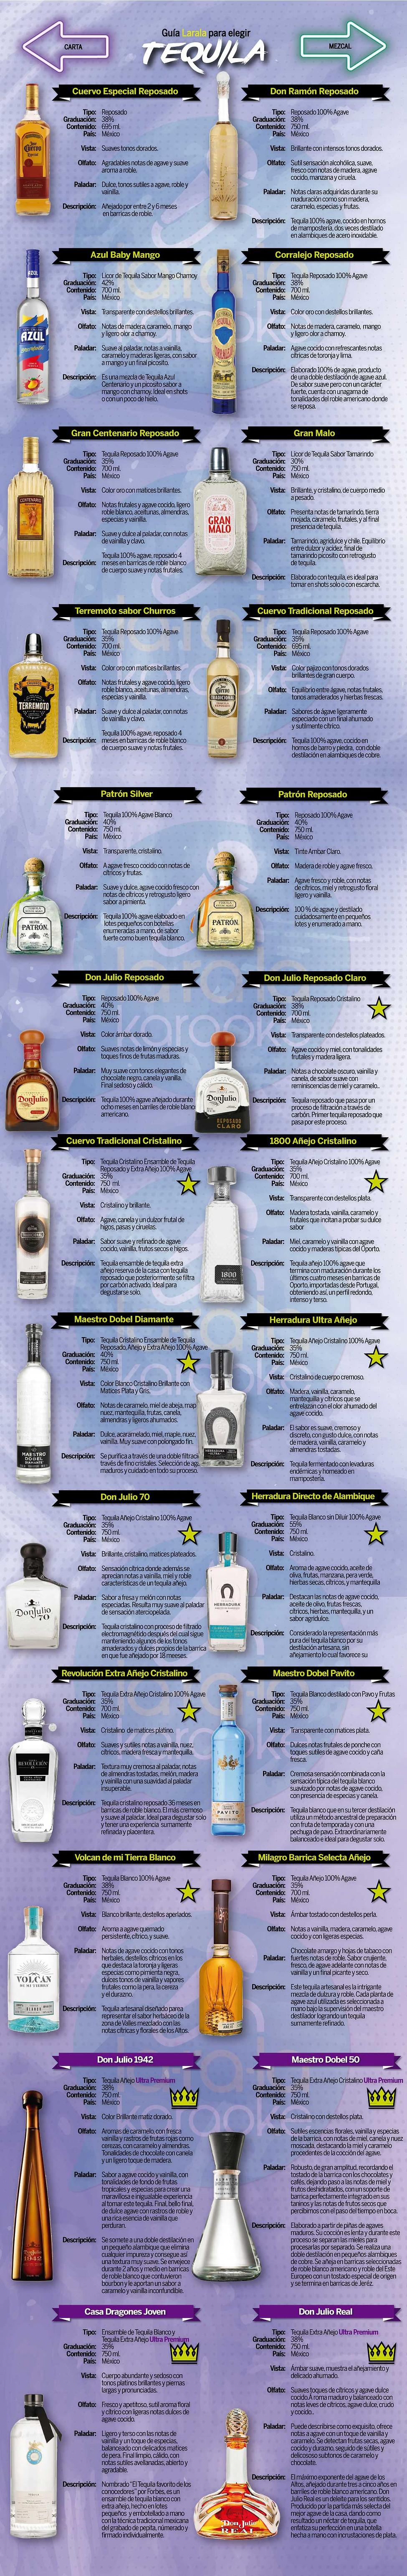 Tequilas1.jpg